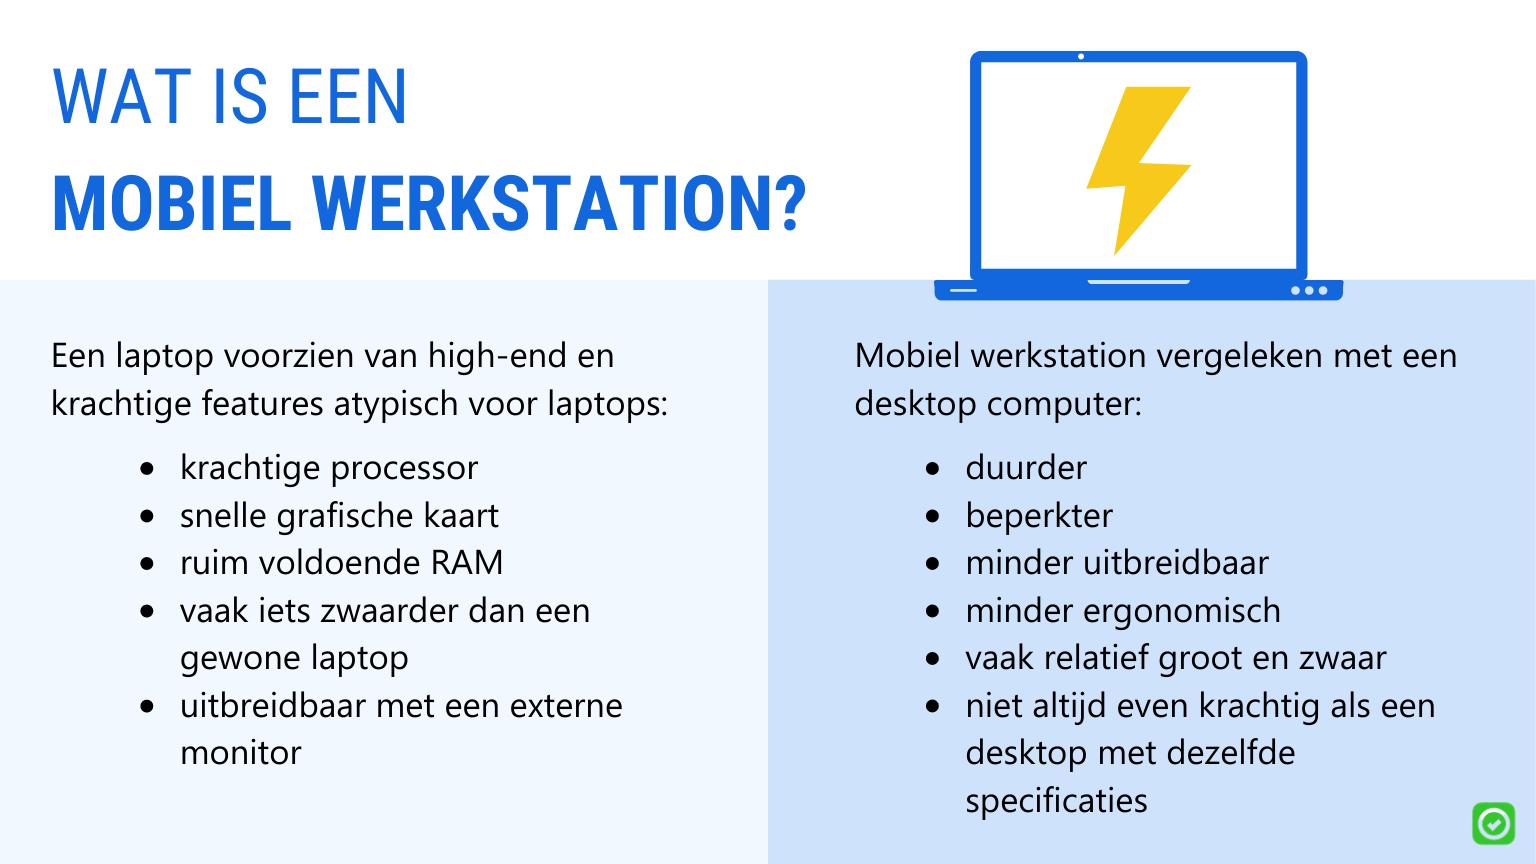 verschil tussen laptop en mobiel werkstation